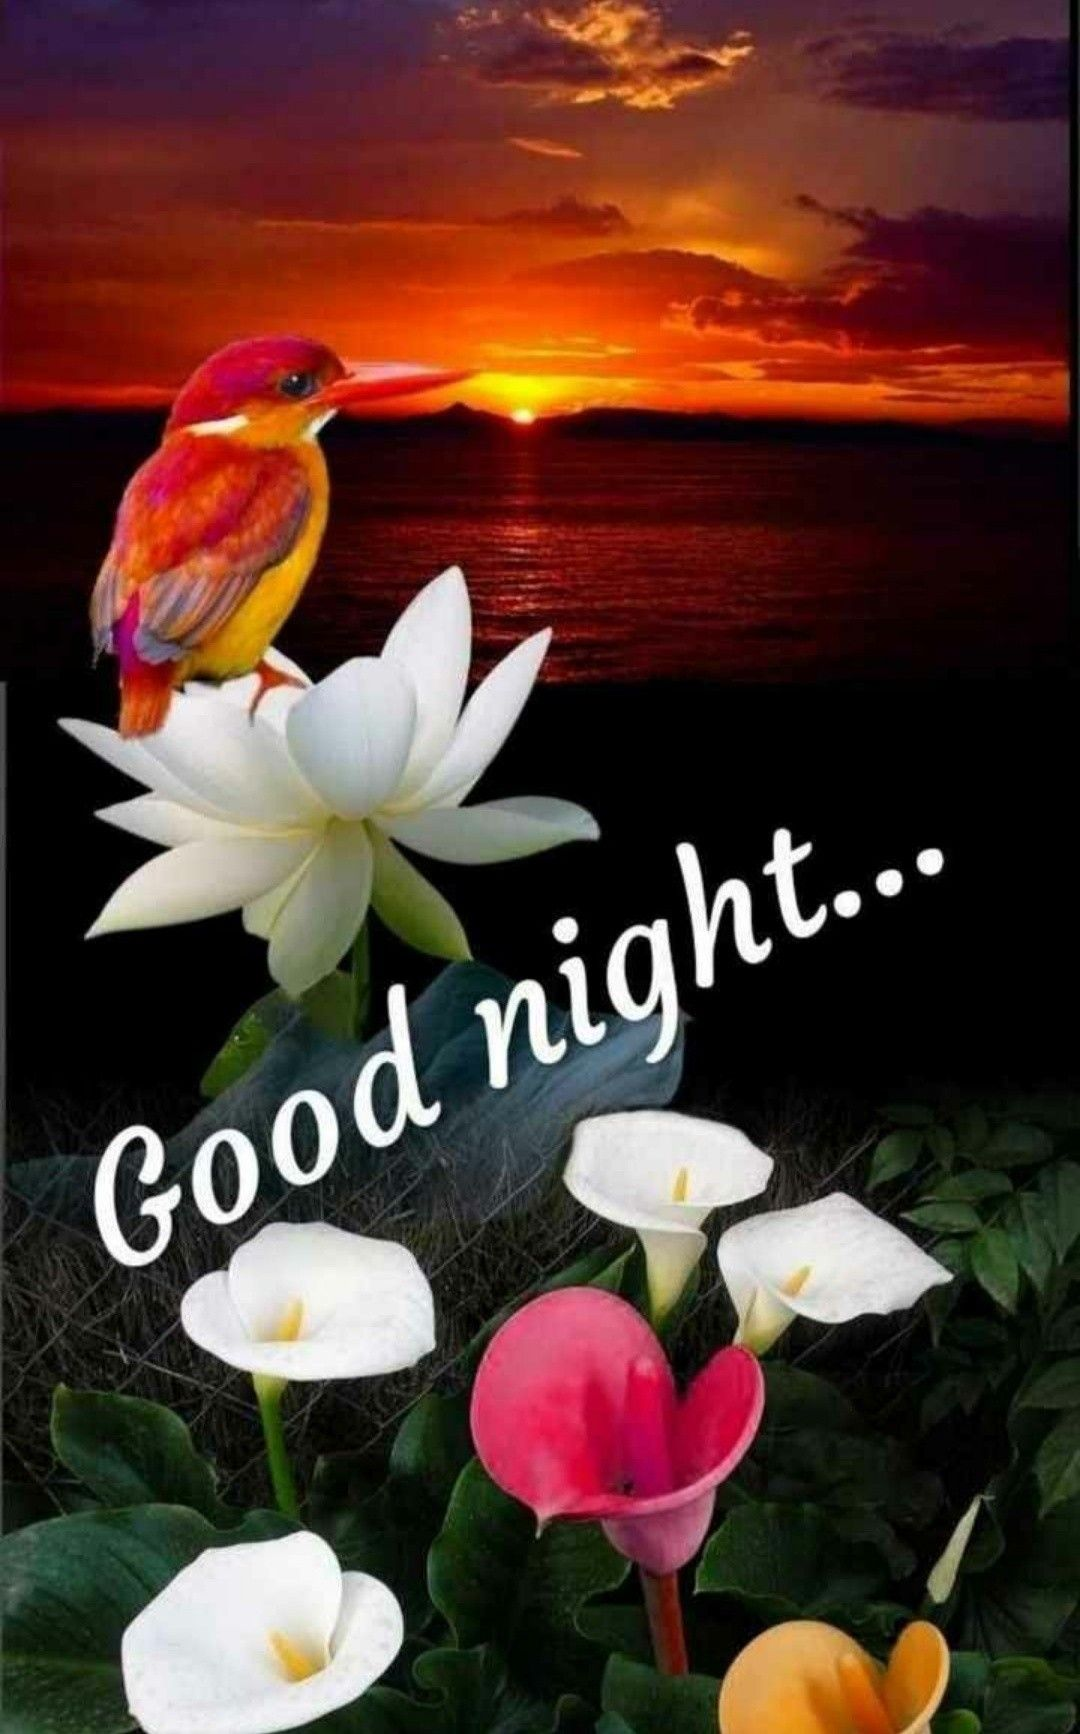 Gold Night Good Night Flowers New Good Night Images Good Night Love Images